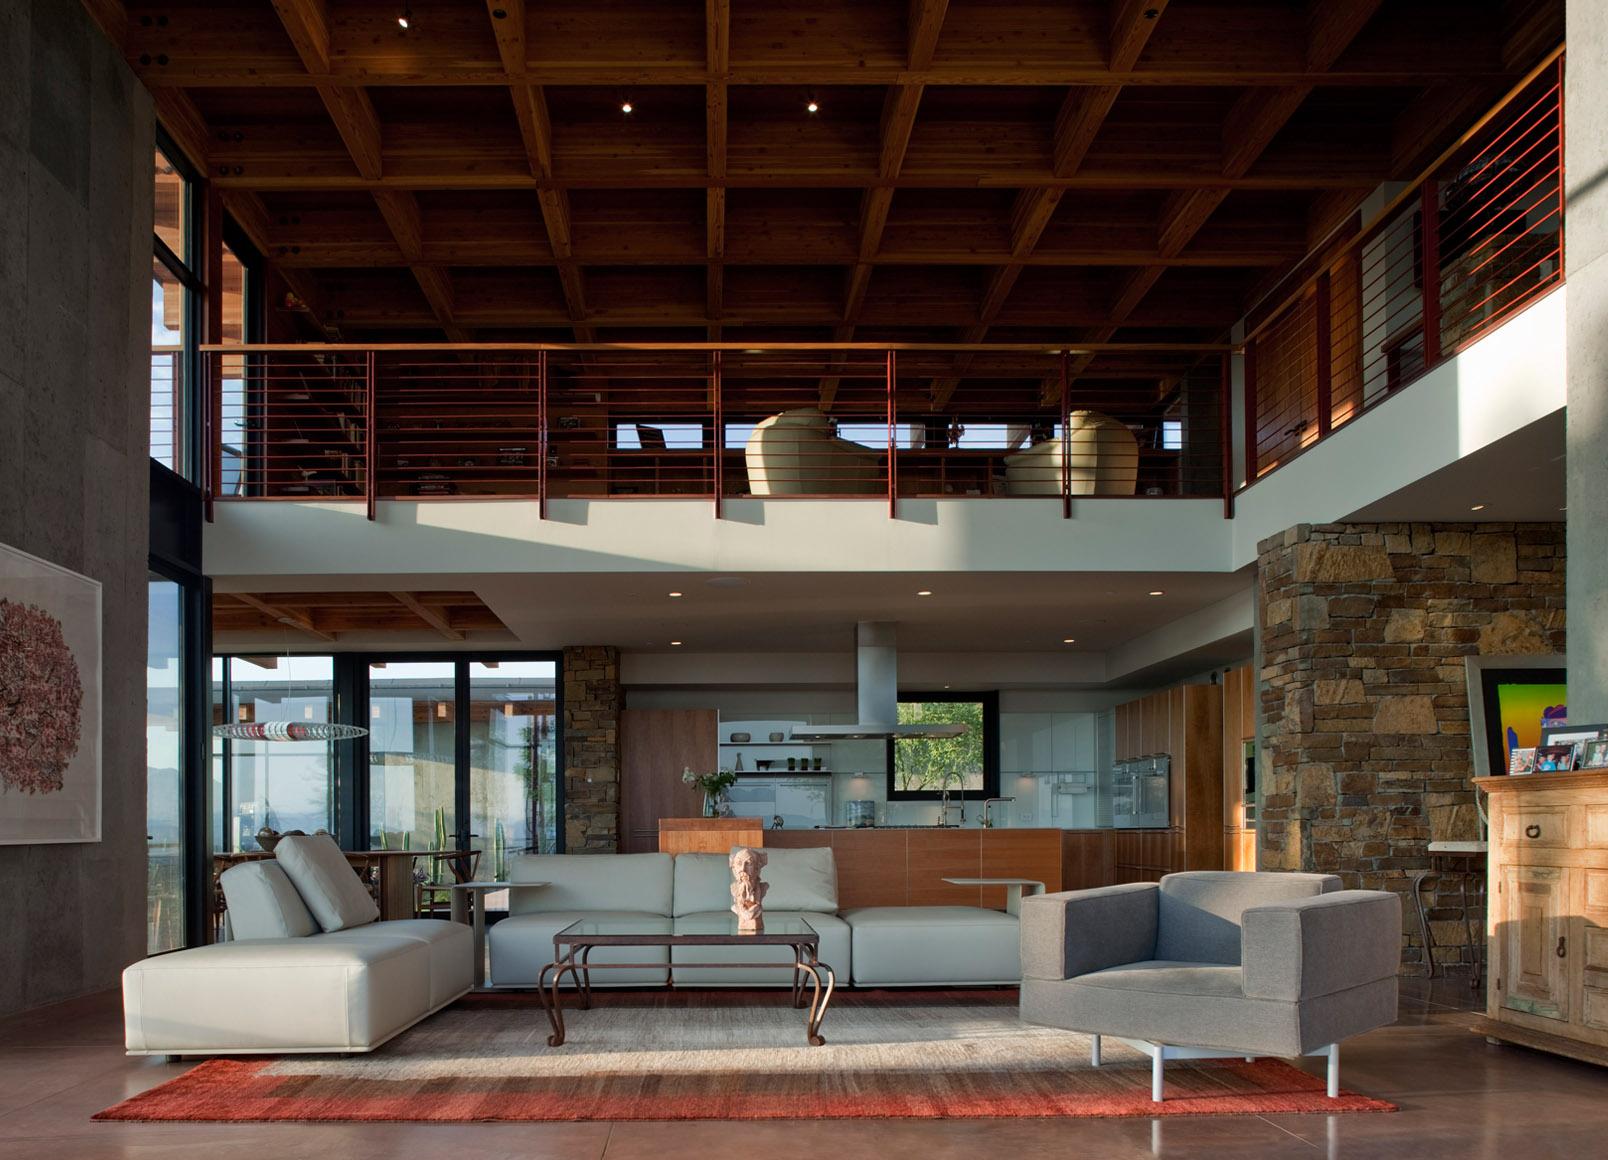 Camelback Mountain Residence - New Construction